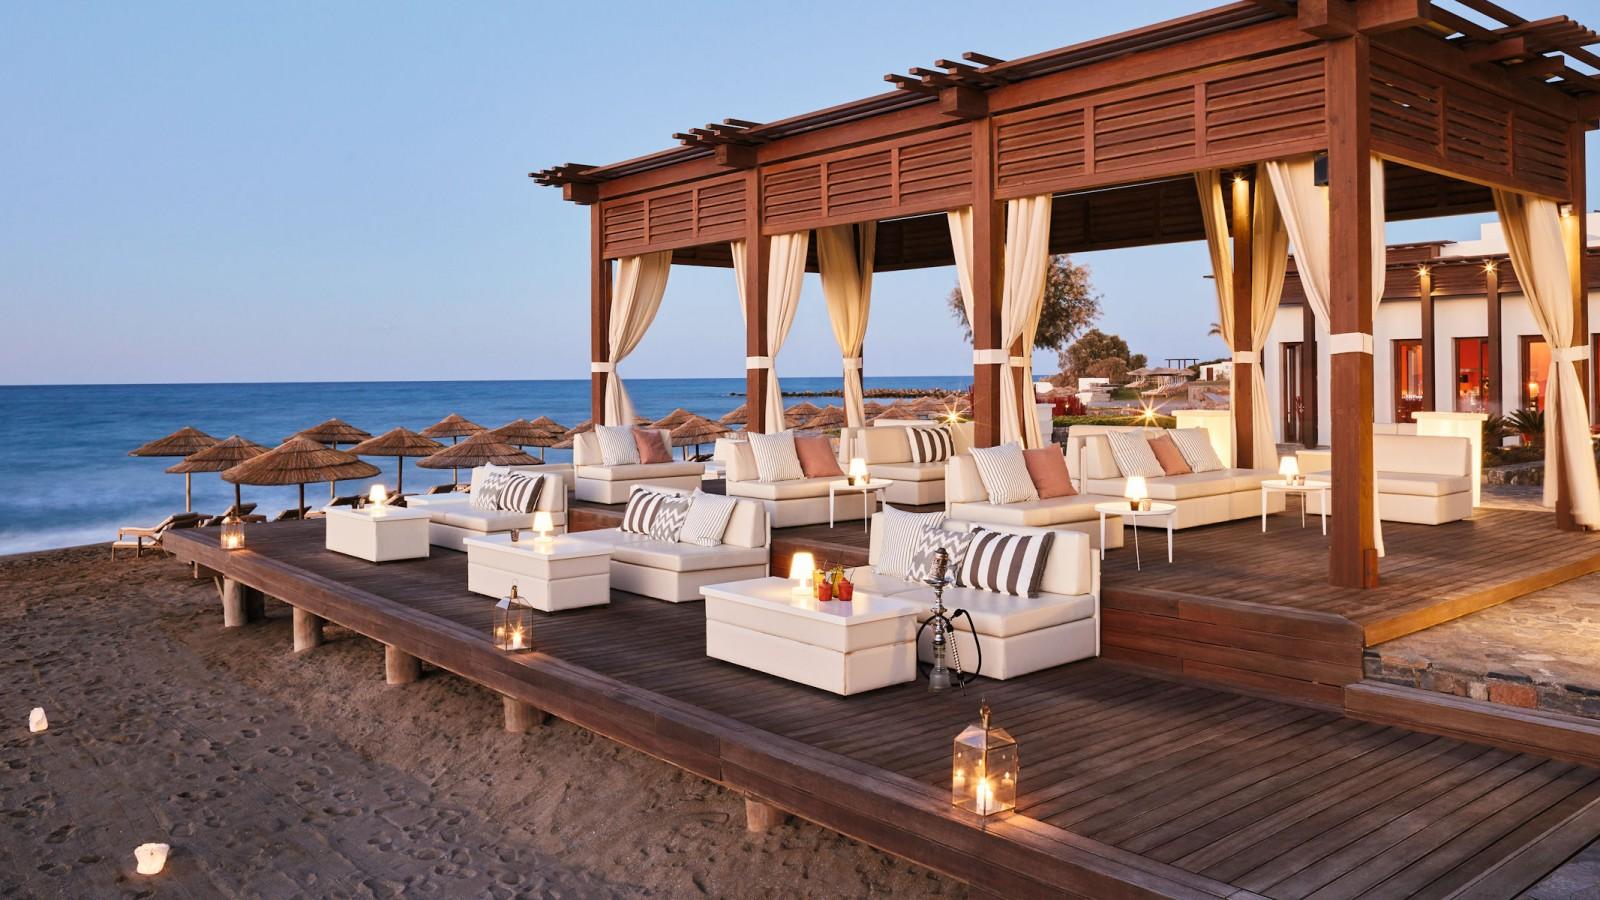 Lounge and Beach Bar Amirandes